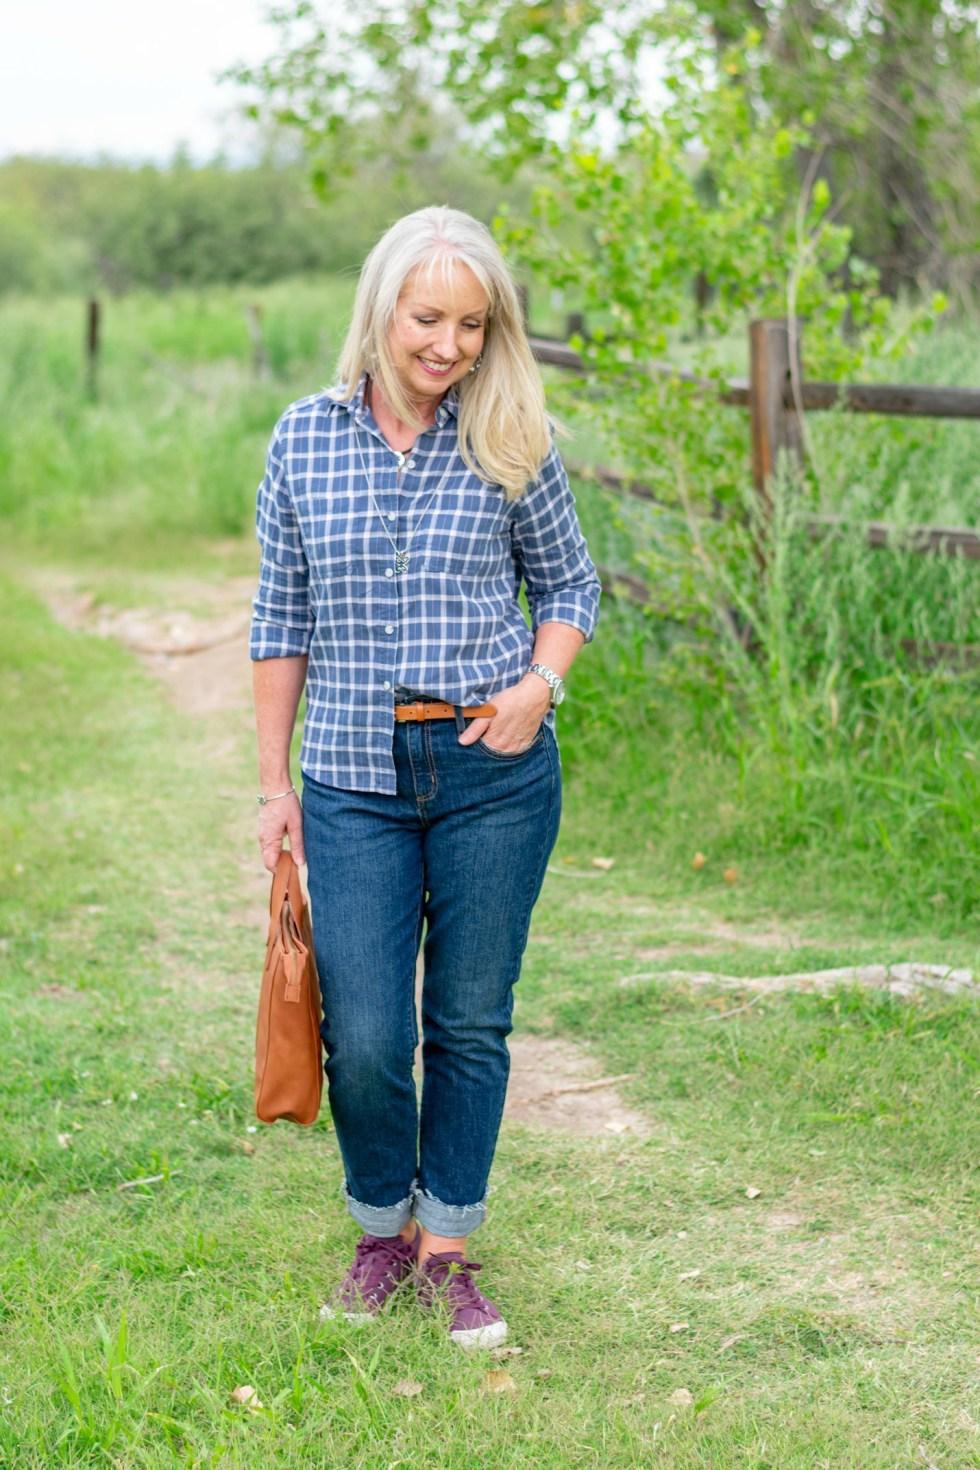 oyfriend-Jeans-Plaid-Button-Up-Top